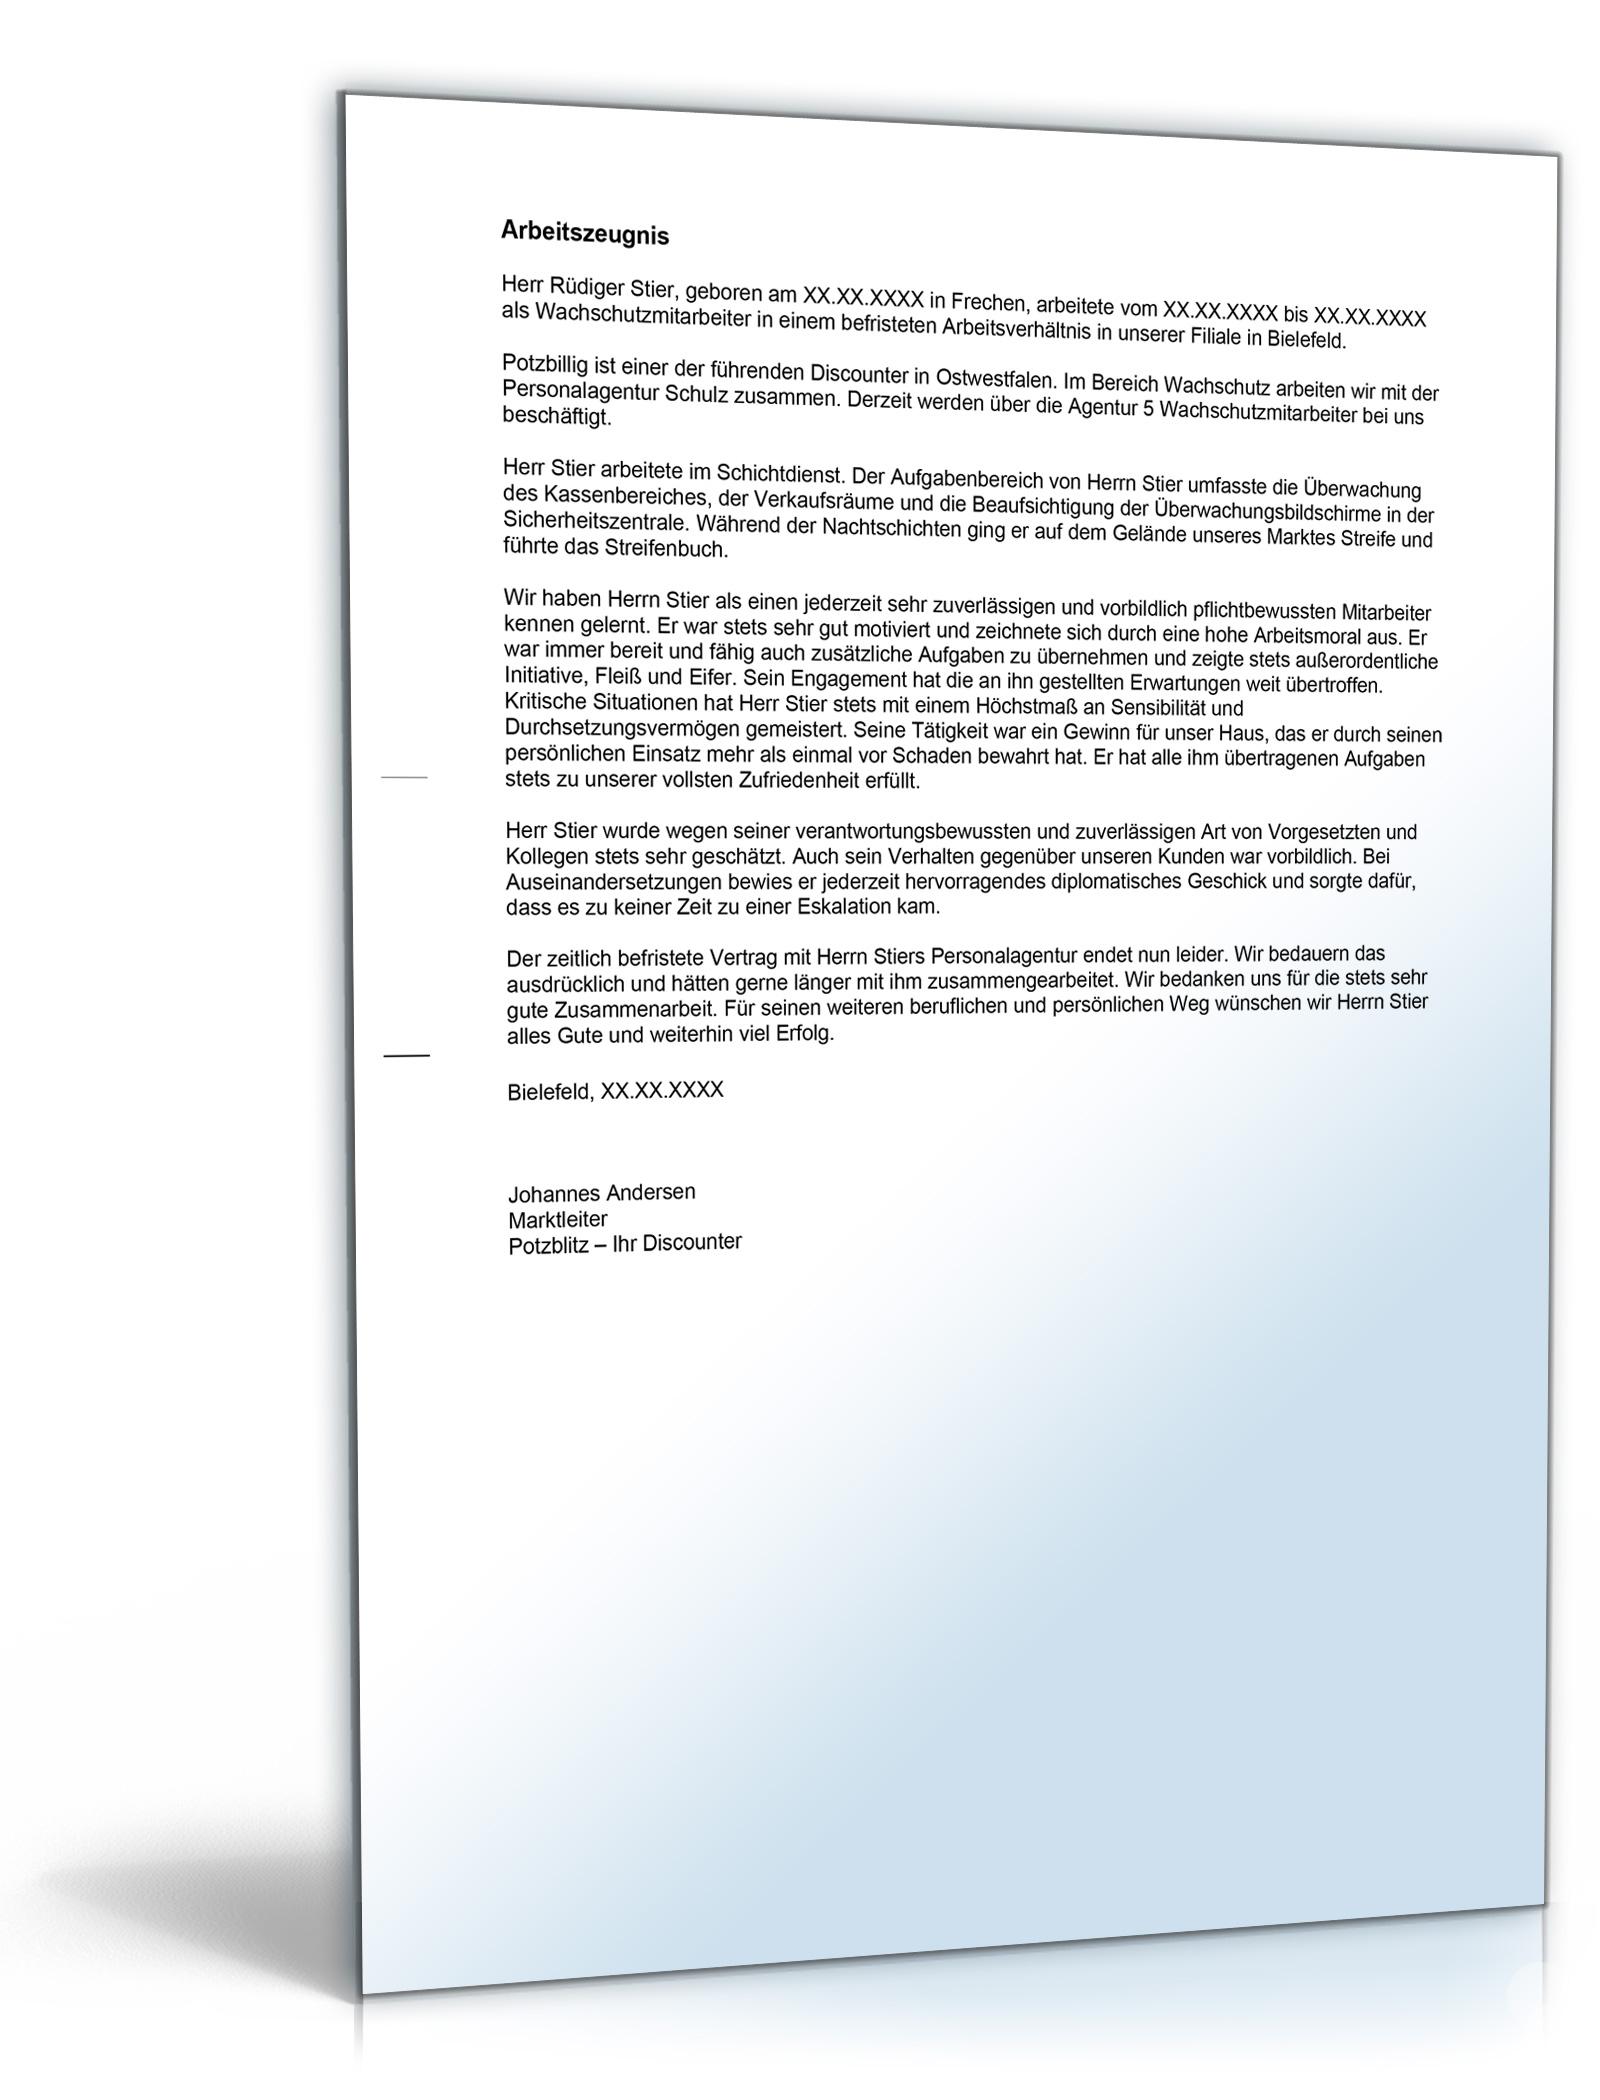 Arbeitszeugnis Wachpersonal Note Eins Word Dokument Amazonde